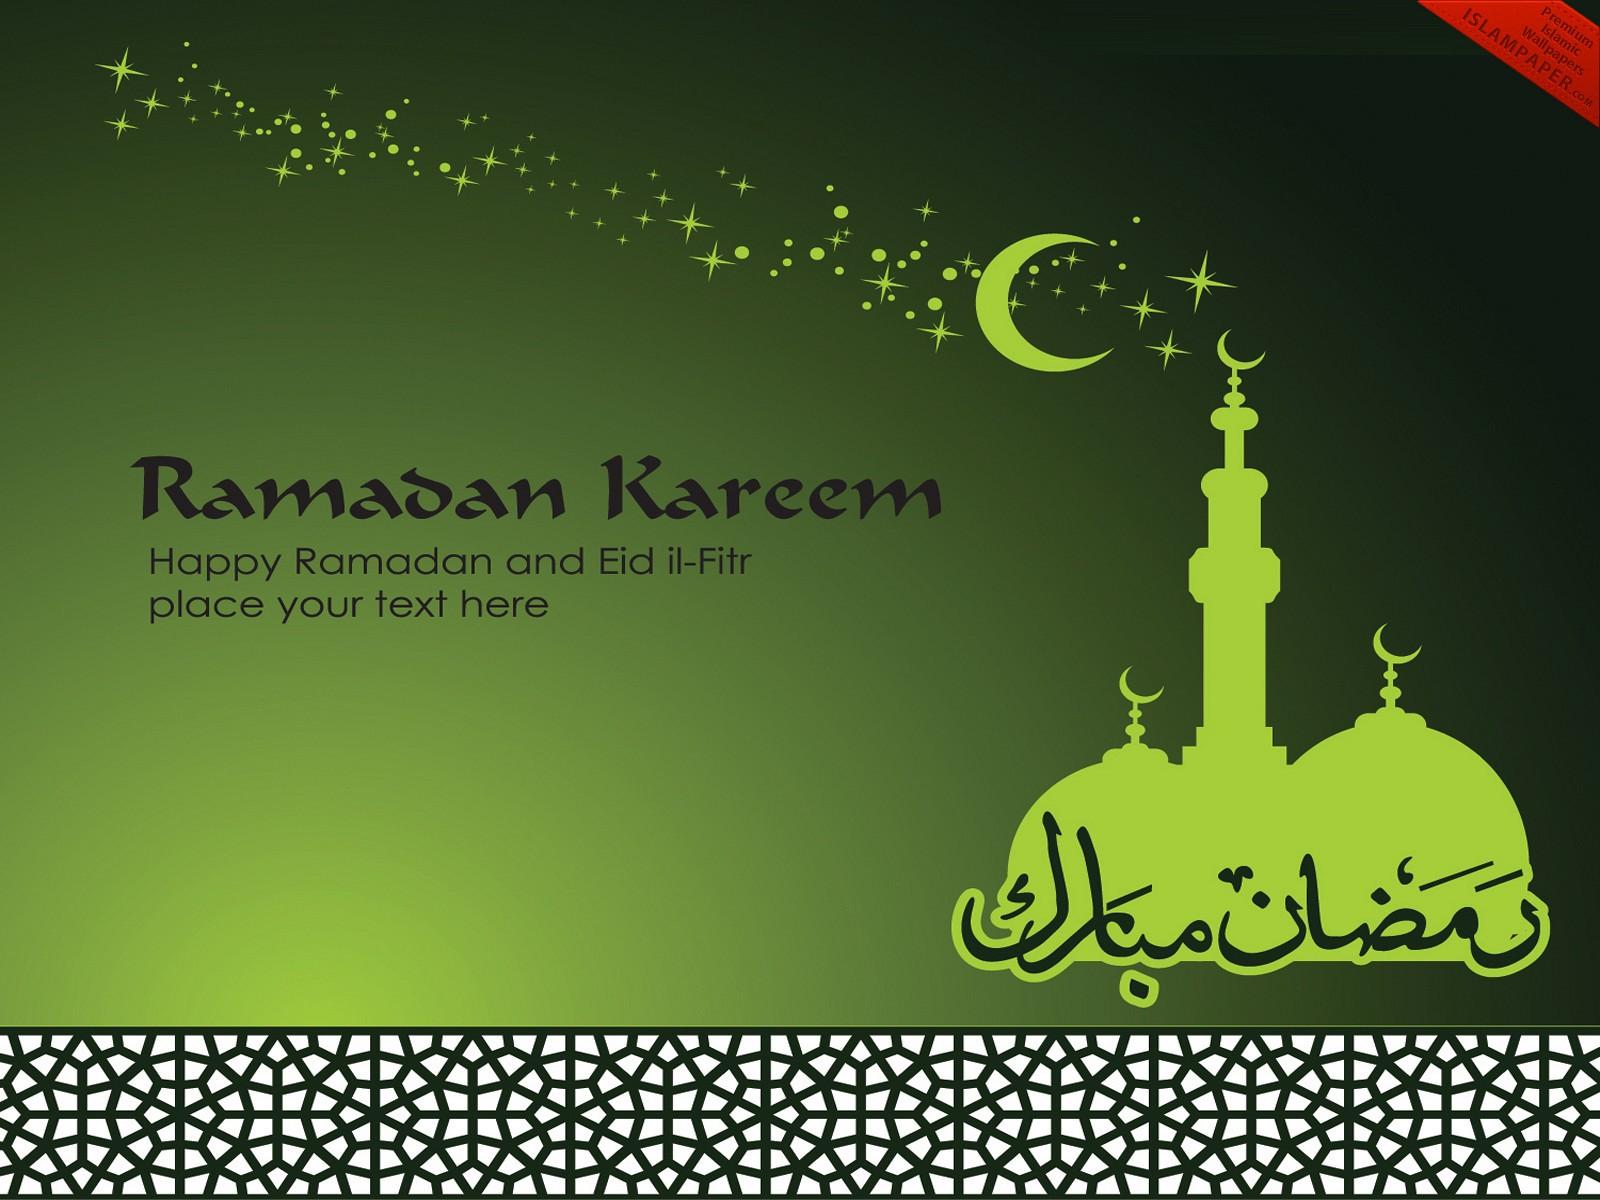 Cool Reminder Ramadan Wallpaper - Holidays___Ramadan_Happy_Ramadan_2014_056409_  Trends_708128 .jpg